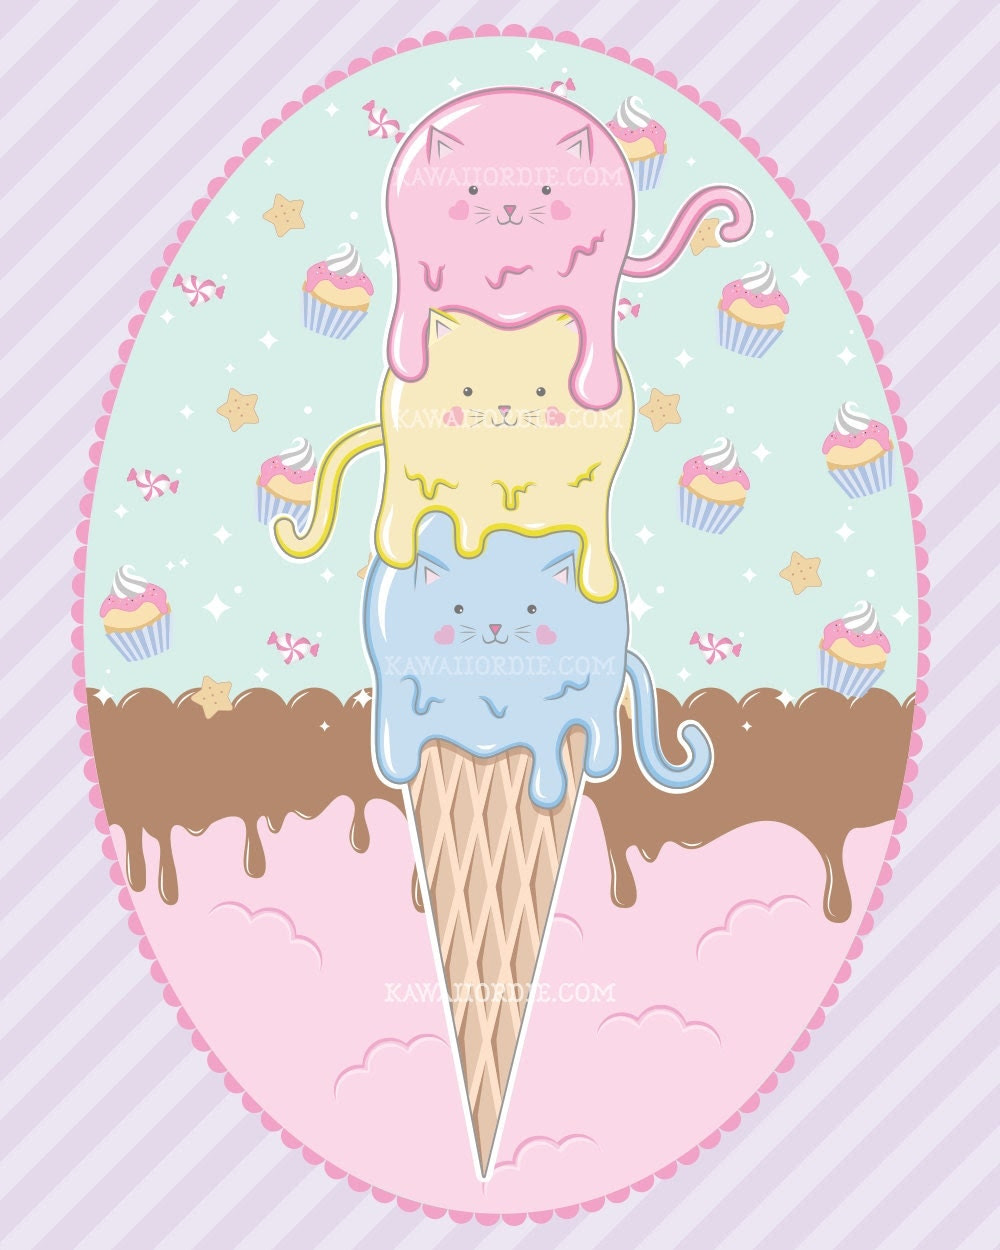 kittens, ice cream, ice cream cone, ice cream shop, cats, pastels, art print